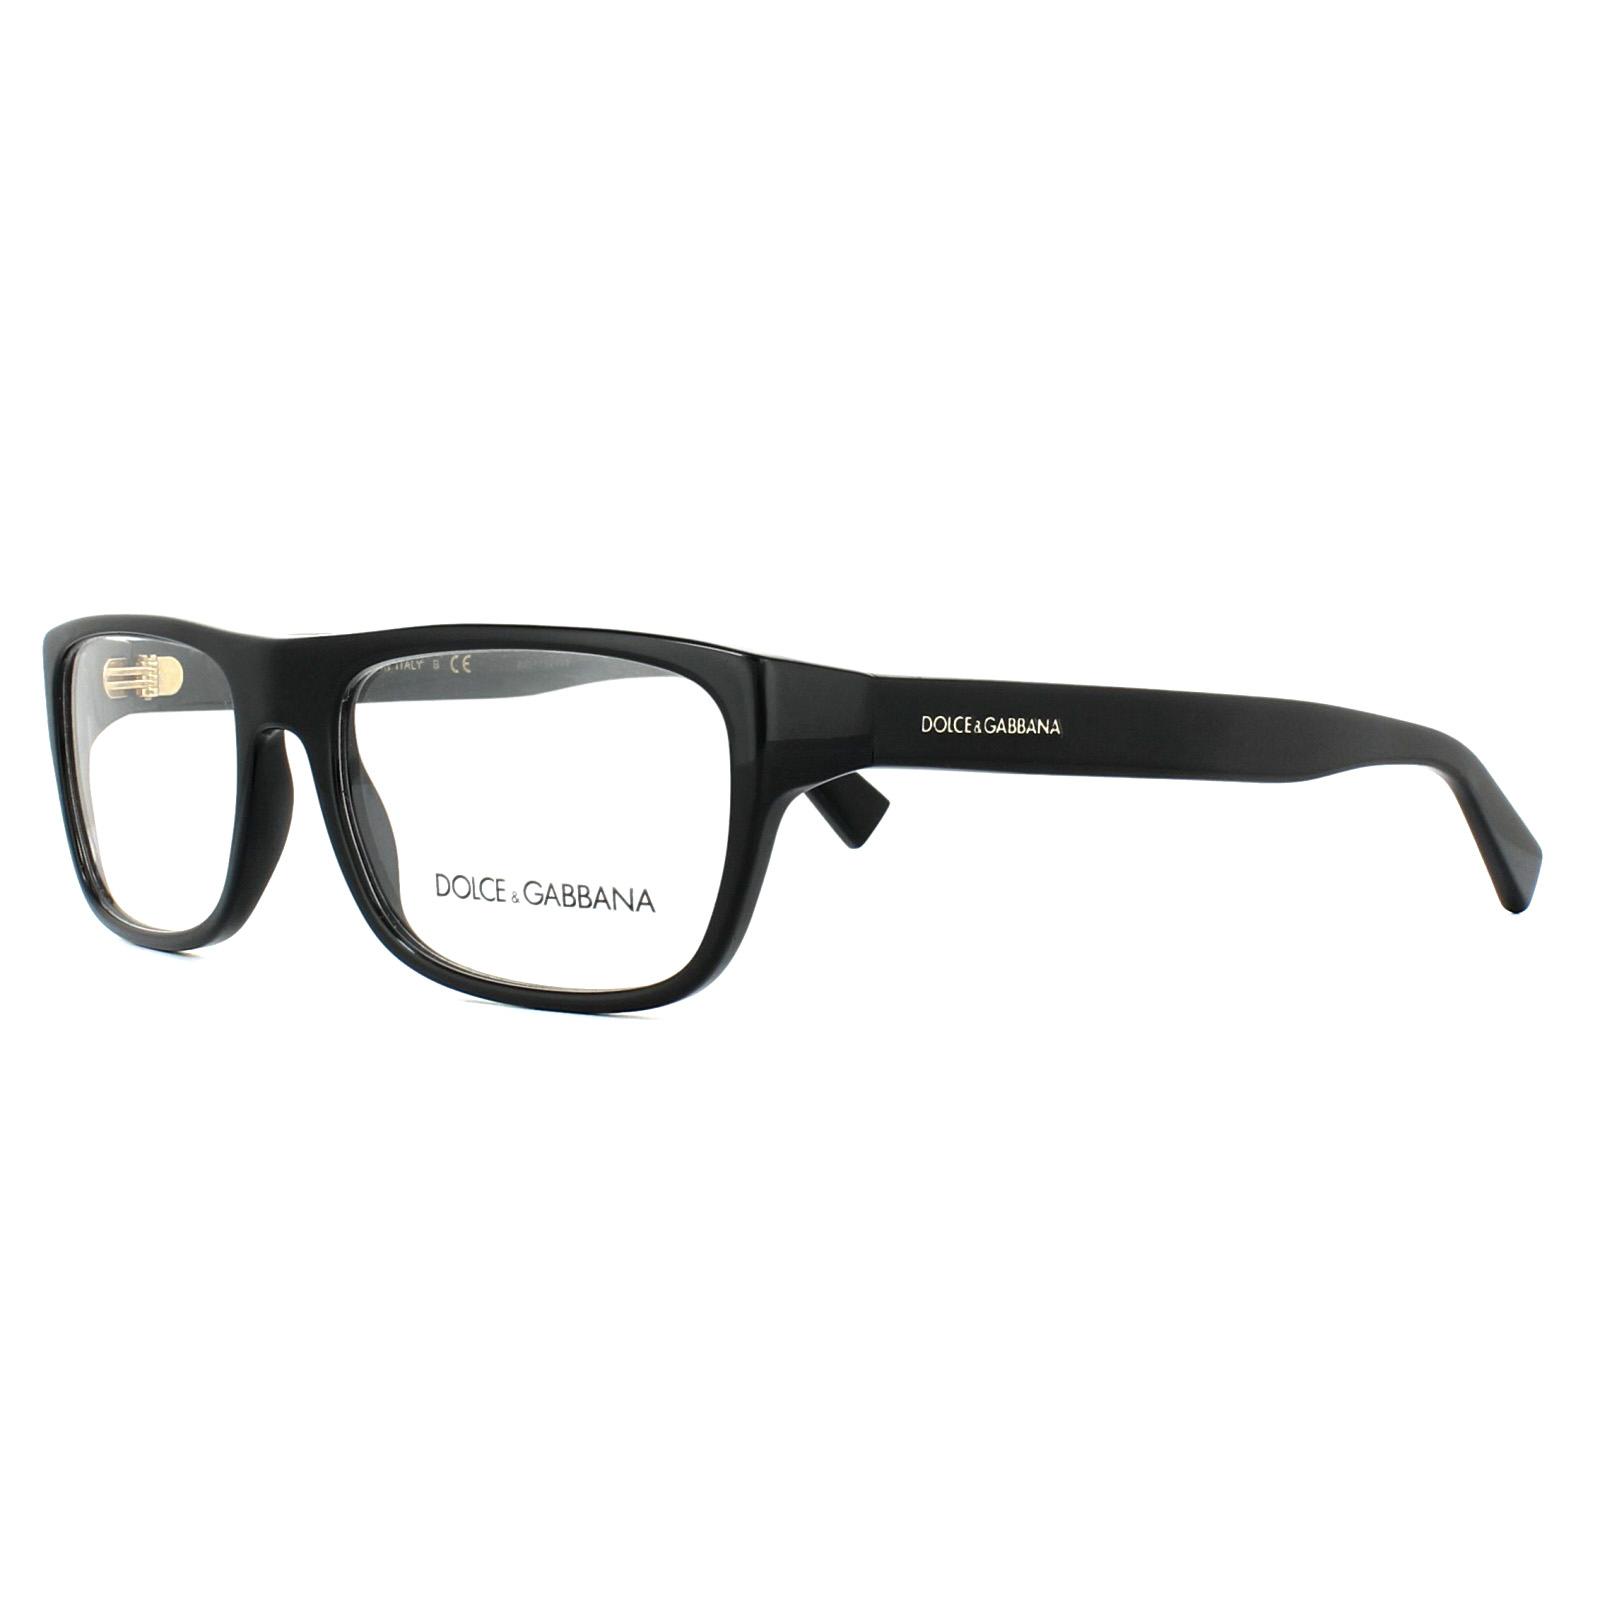 9e8ec89e127b Sentinel Dolce & Gabbana Glasses Frames DG 3276 501 Black 52mm Mens